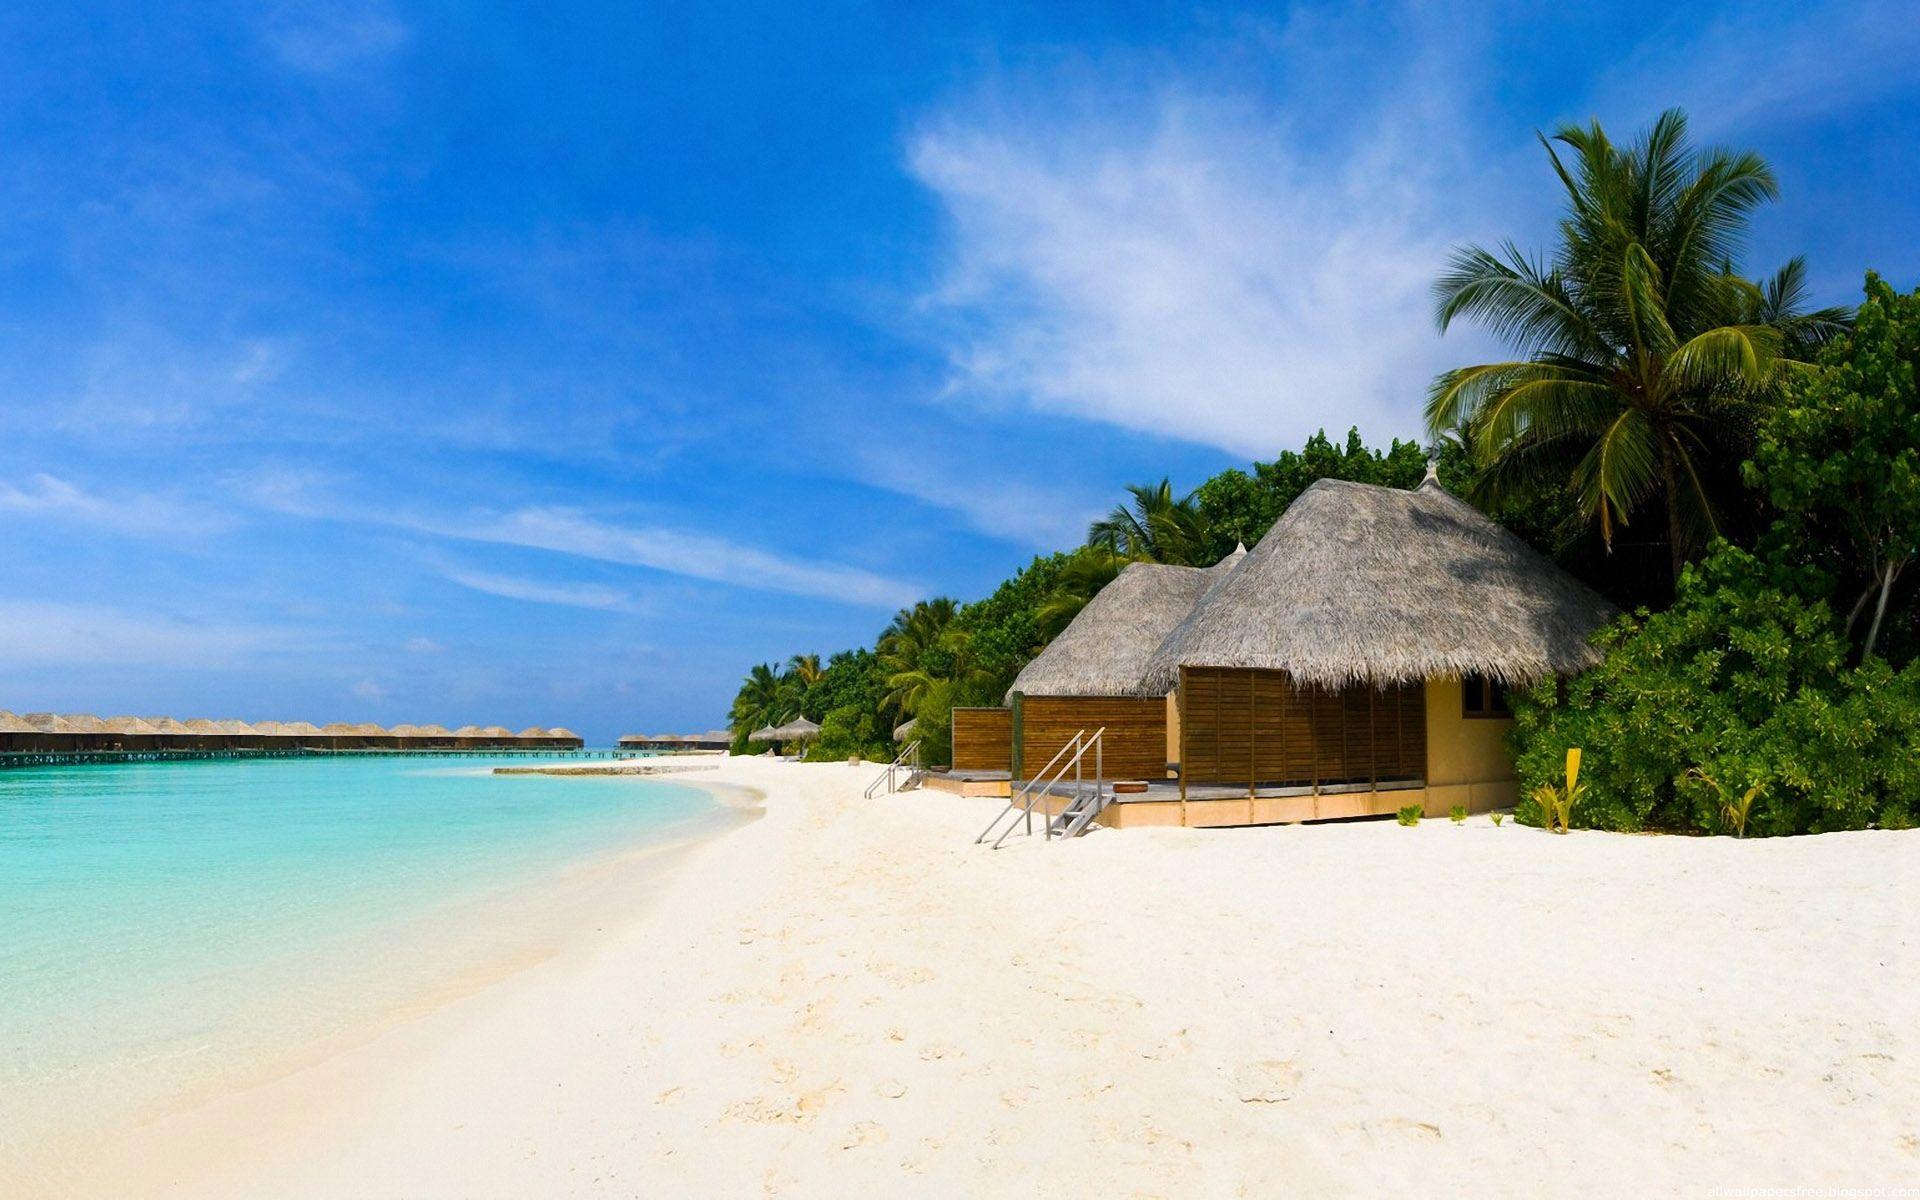 amazing holiday beach wallpapers hd | beach | pinterest | beach